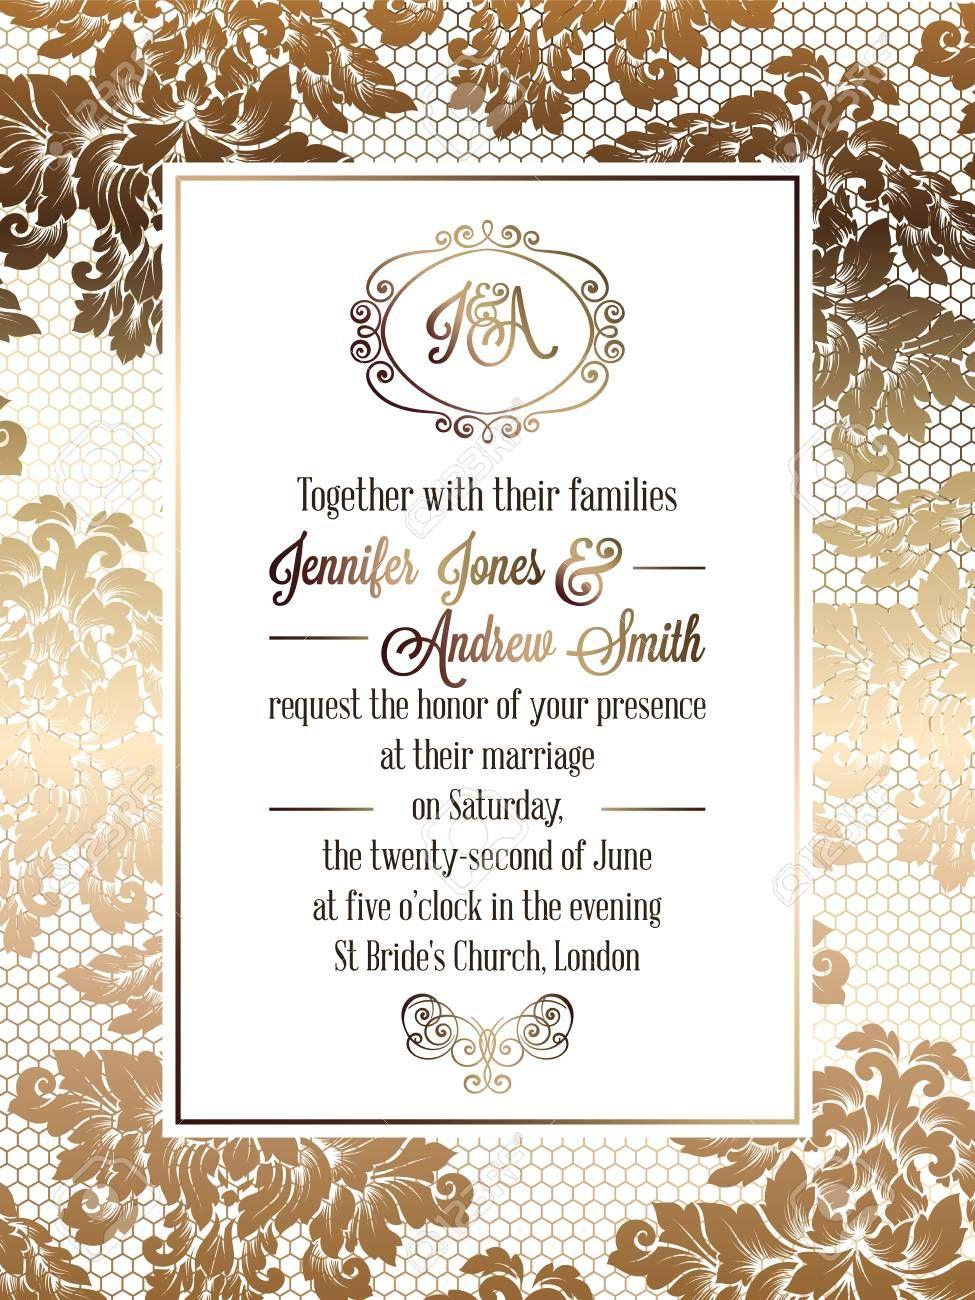 Vintage Baroque Style Wedding Invitation Card Template Elegant Pertaining T Wedding Invitation Templates Wedding Invitation Cards Wedding Invitation Design